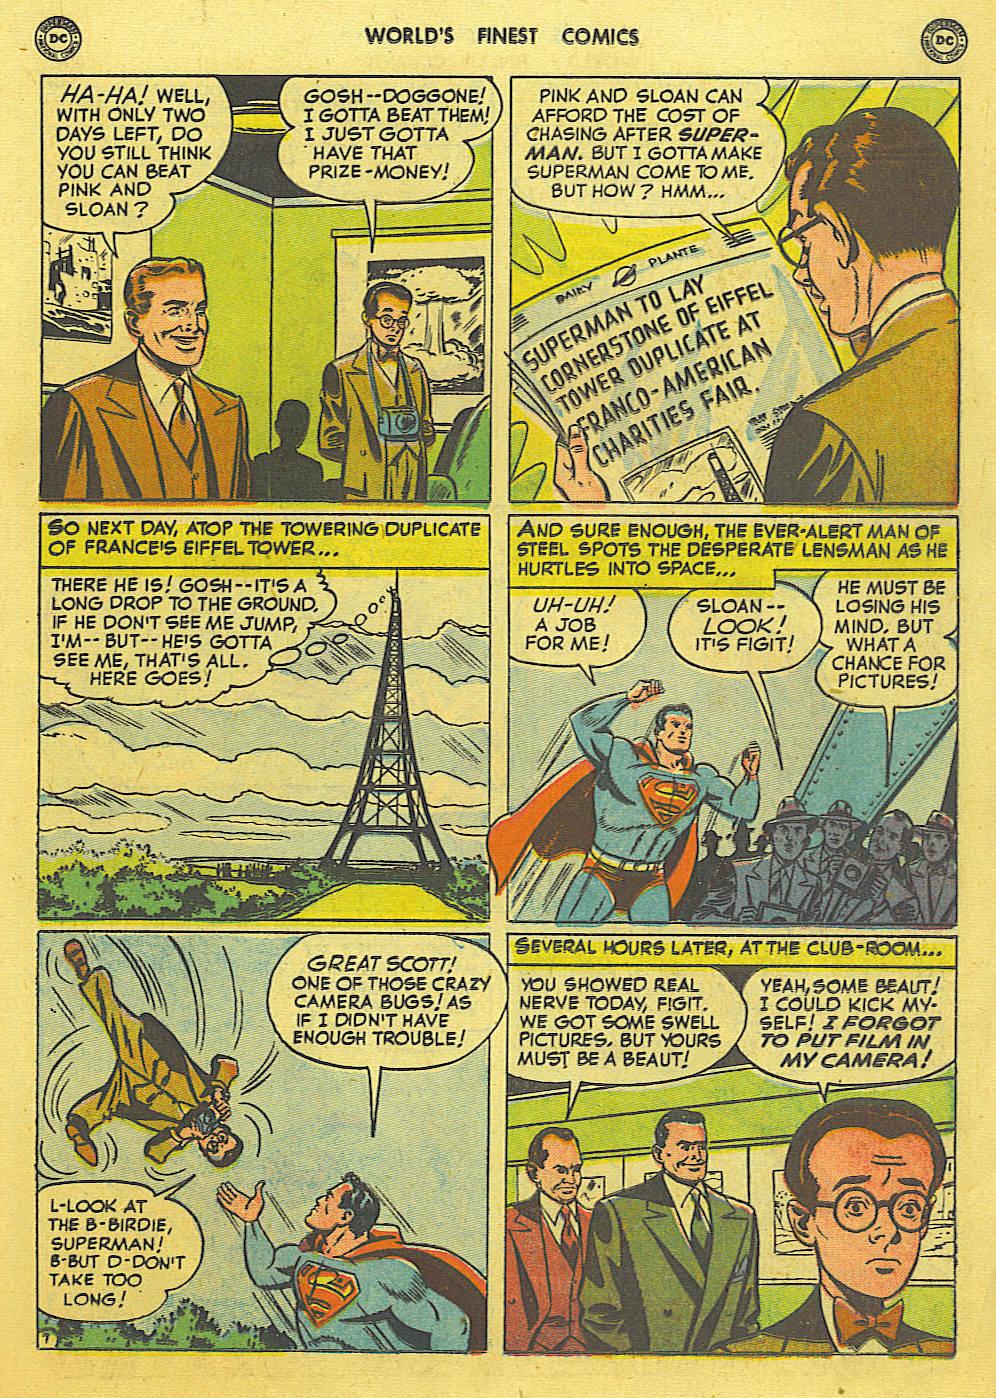 Read online World's Finest Comics comic -  Issue #49 - 10